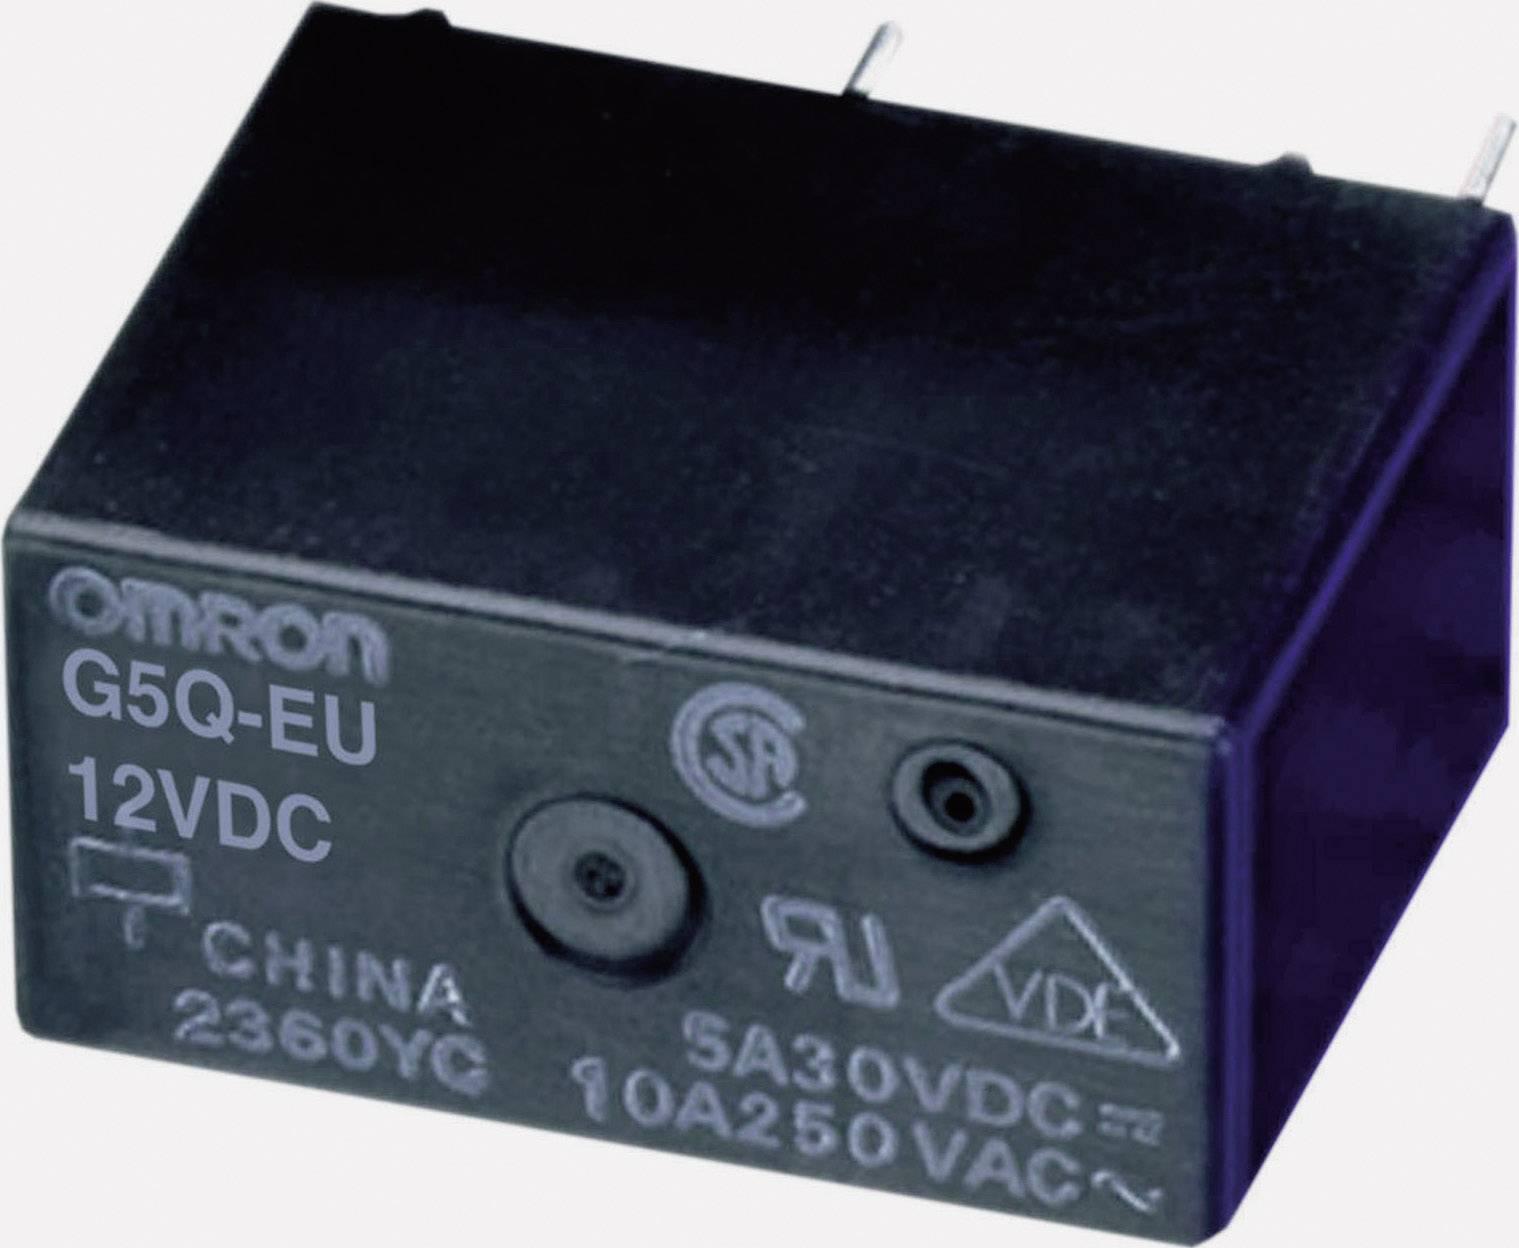 Kompaktní PCB Power relé Omron G5Q-1A-EU 12DC, 12 V/DC, 5 A